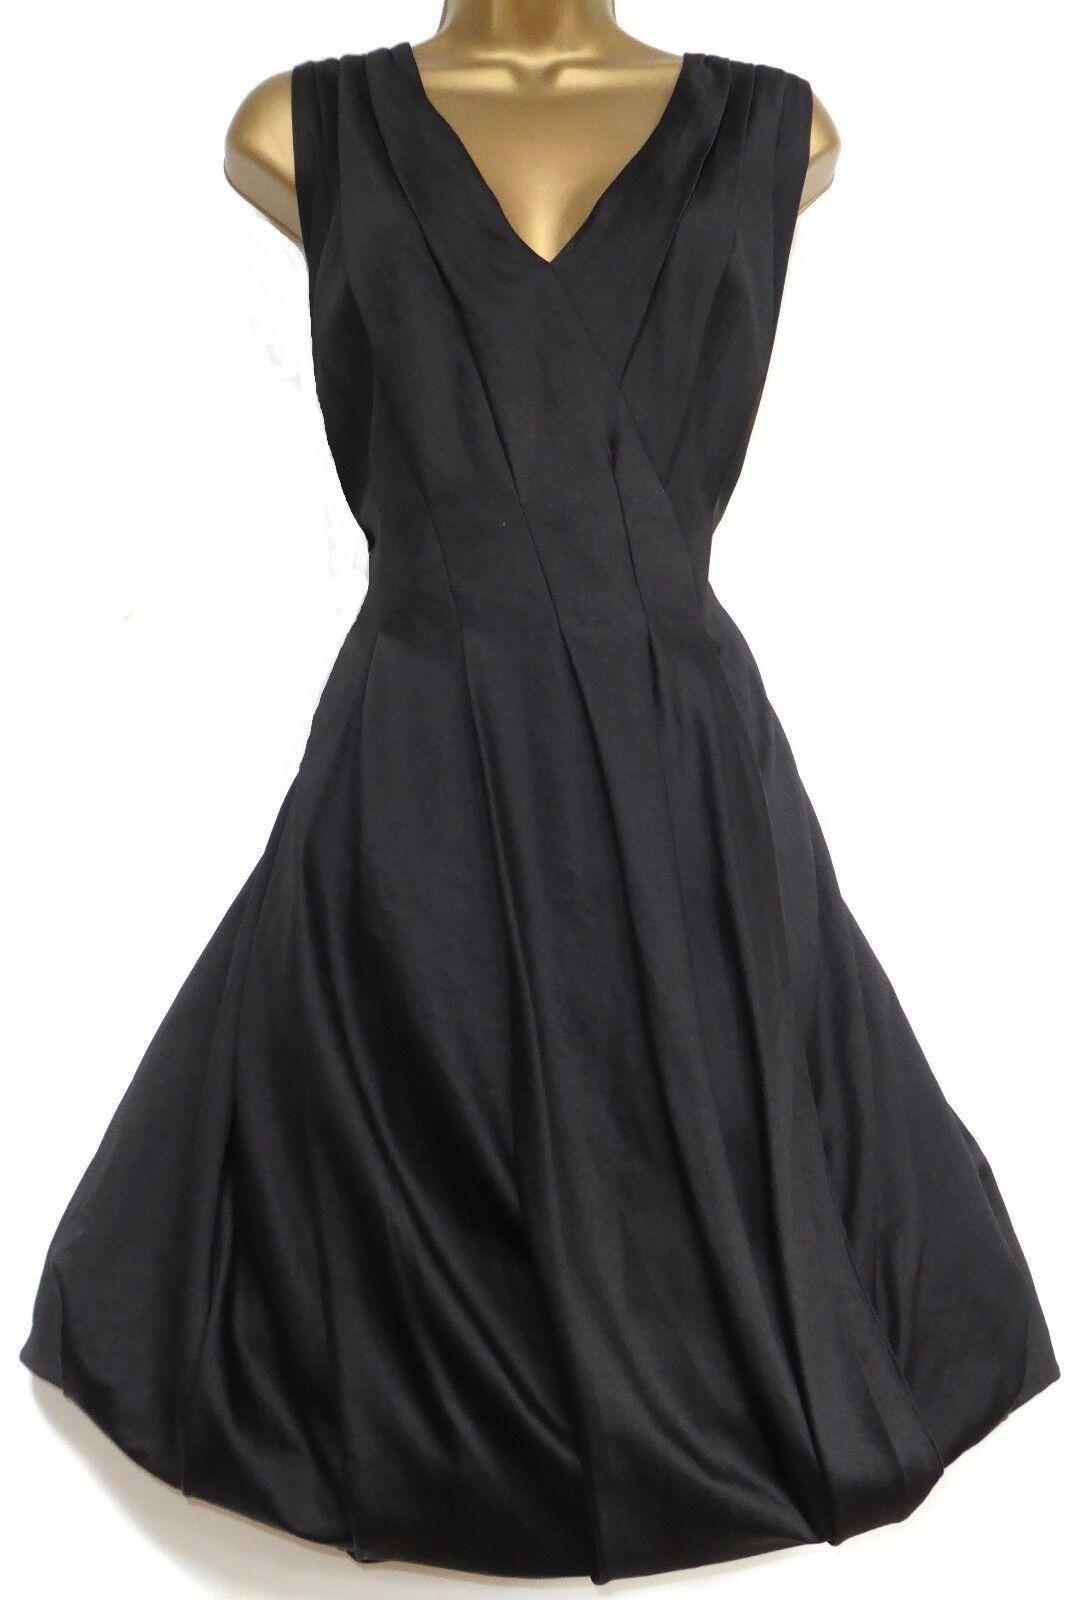 Monsoon ✩ SPLENDIDA Nero Erin autostop Orlo bolla Cocktail Party Dress ✩